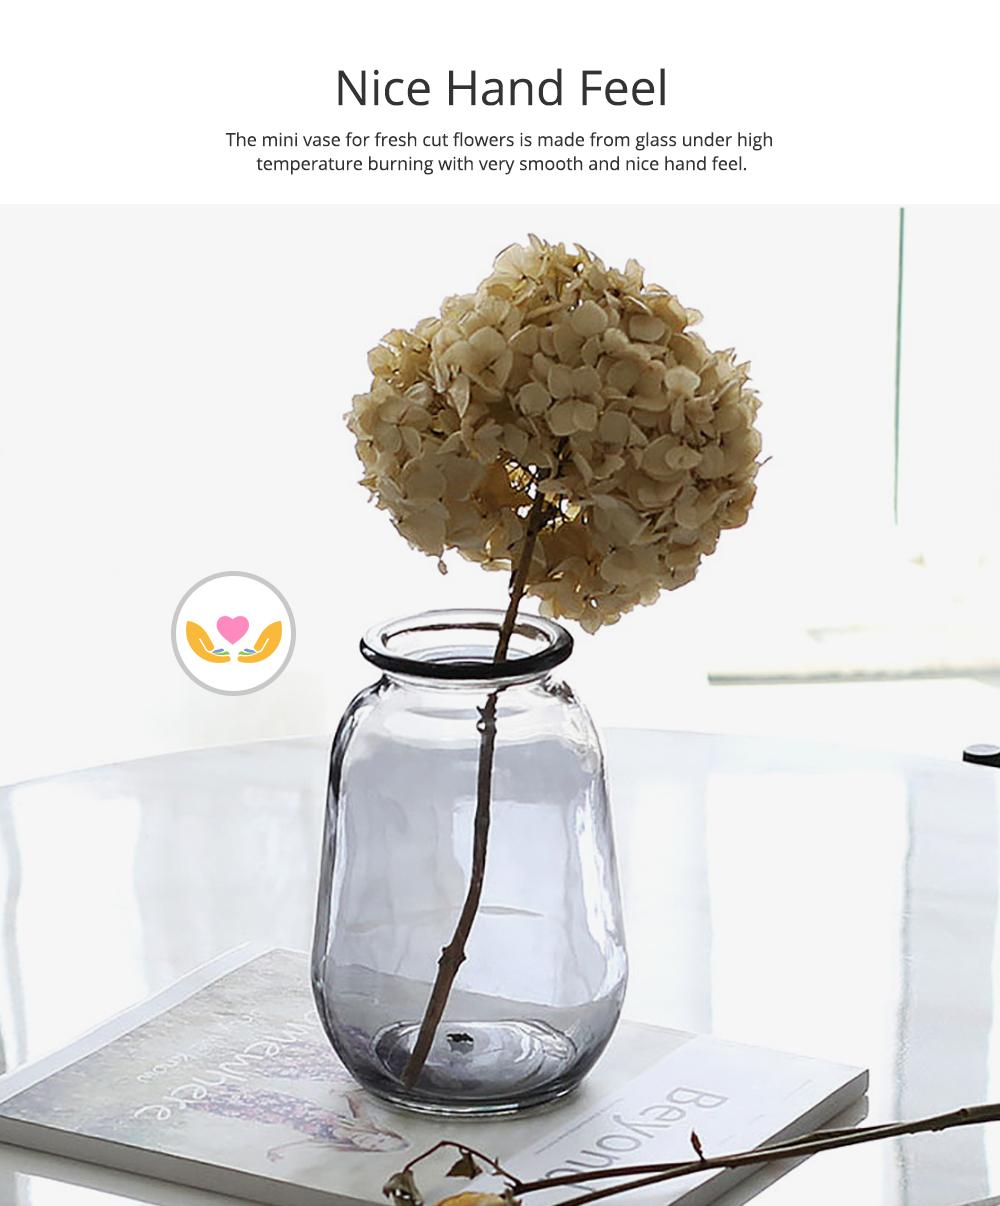 Mini Glass Vases for Centerpieces Cheap Bulk Large Diameter Glass Vase Transparent Vase for Fresh Cut Flowers Dish Table Decorative Vase 1